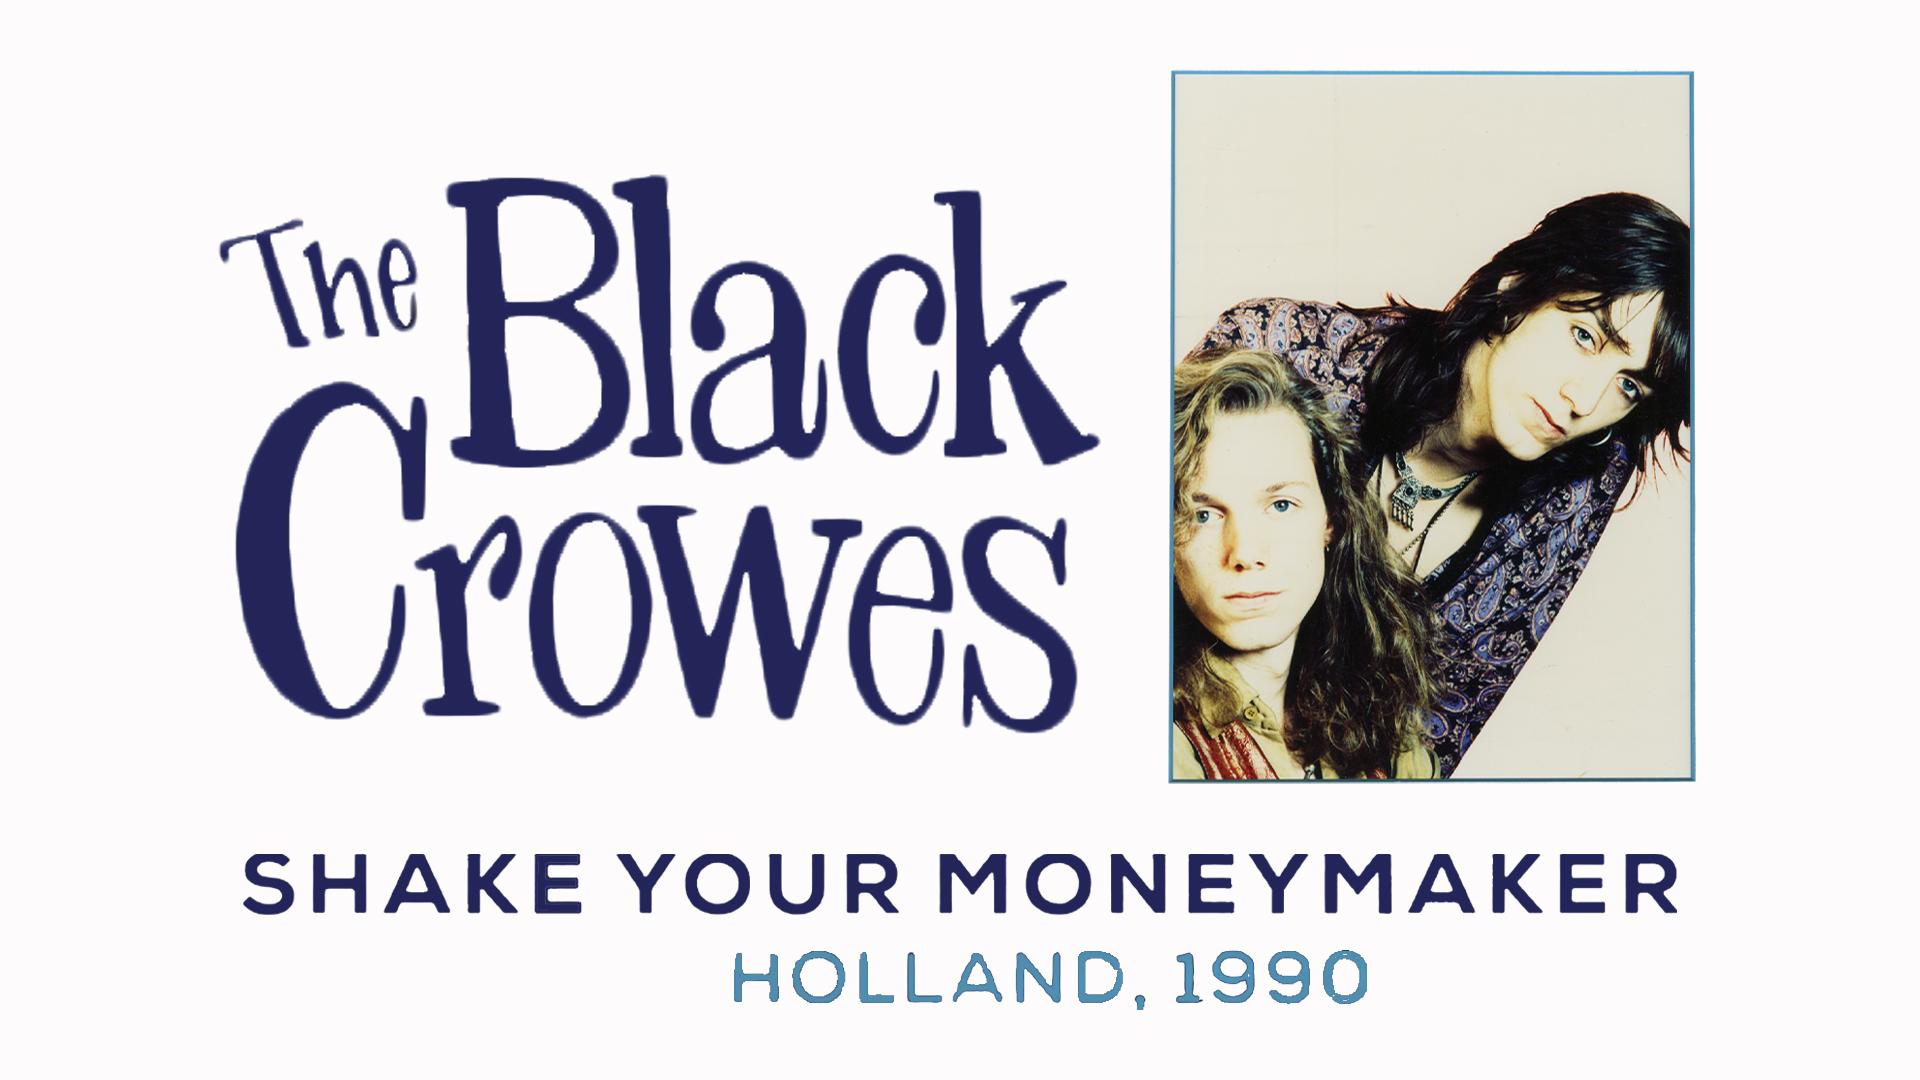 Shake Your Money Maker Holland 1990